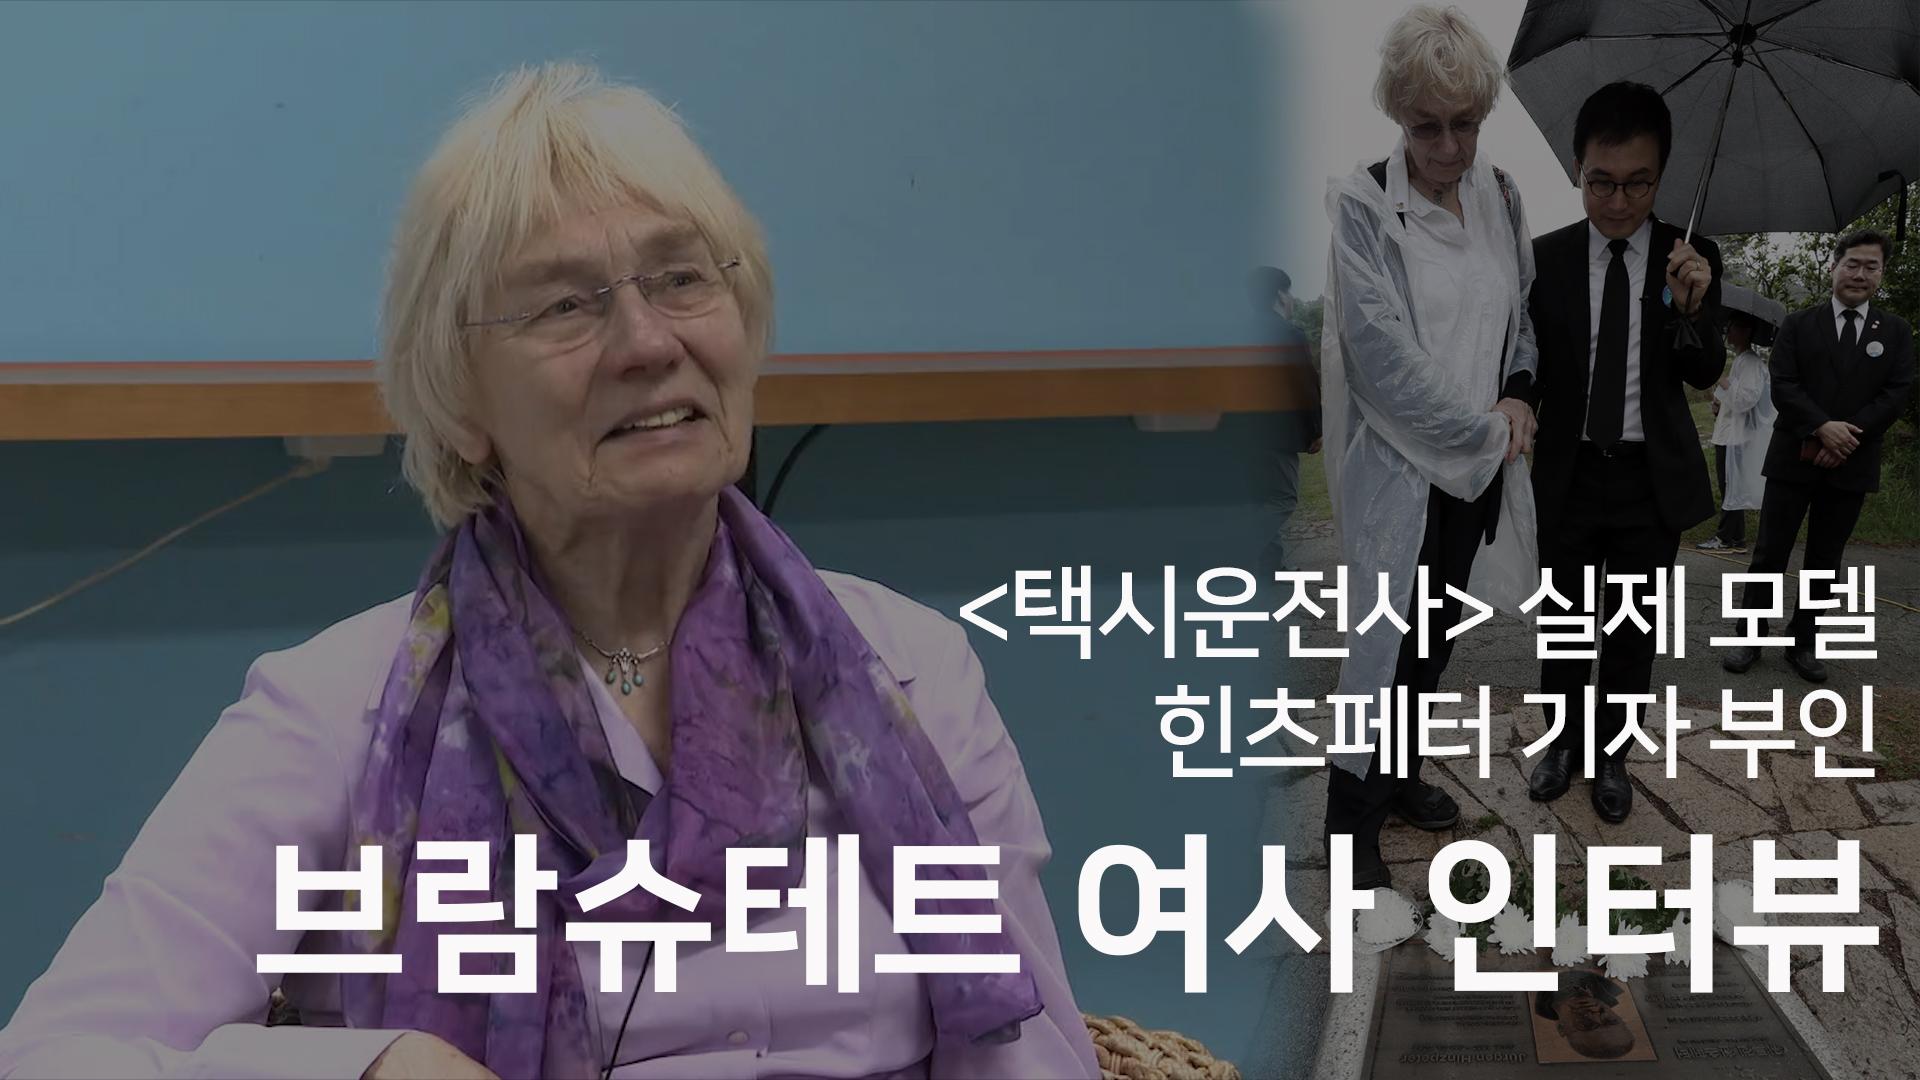 tbs 브람슈테트 여사 인터뷰 - 한국 그리고 힌츠페터 기자